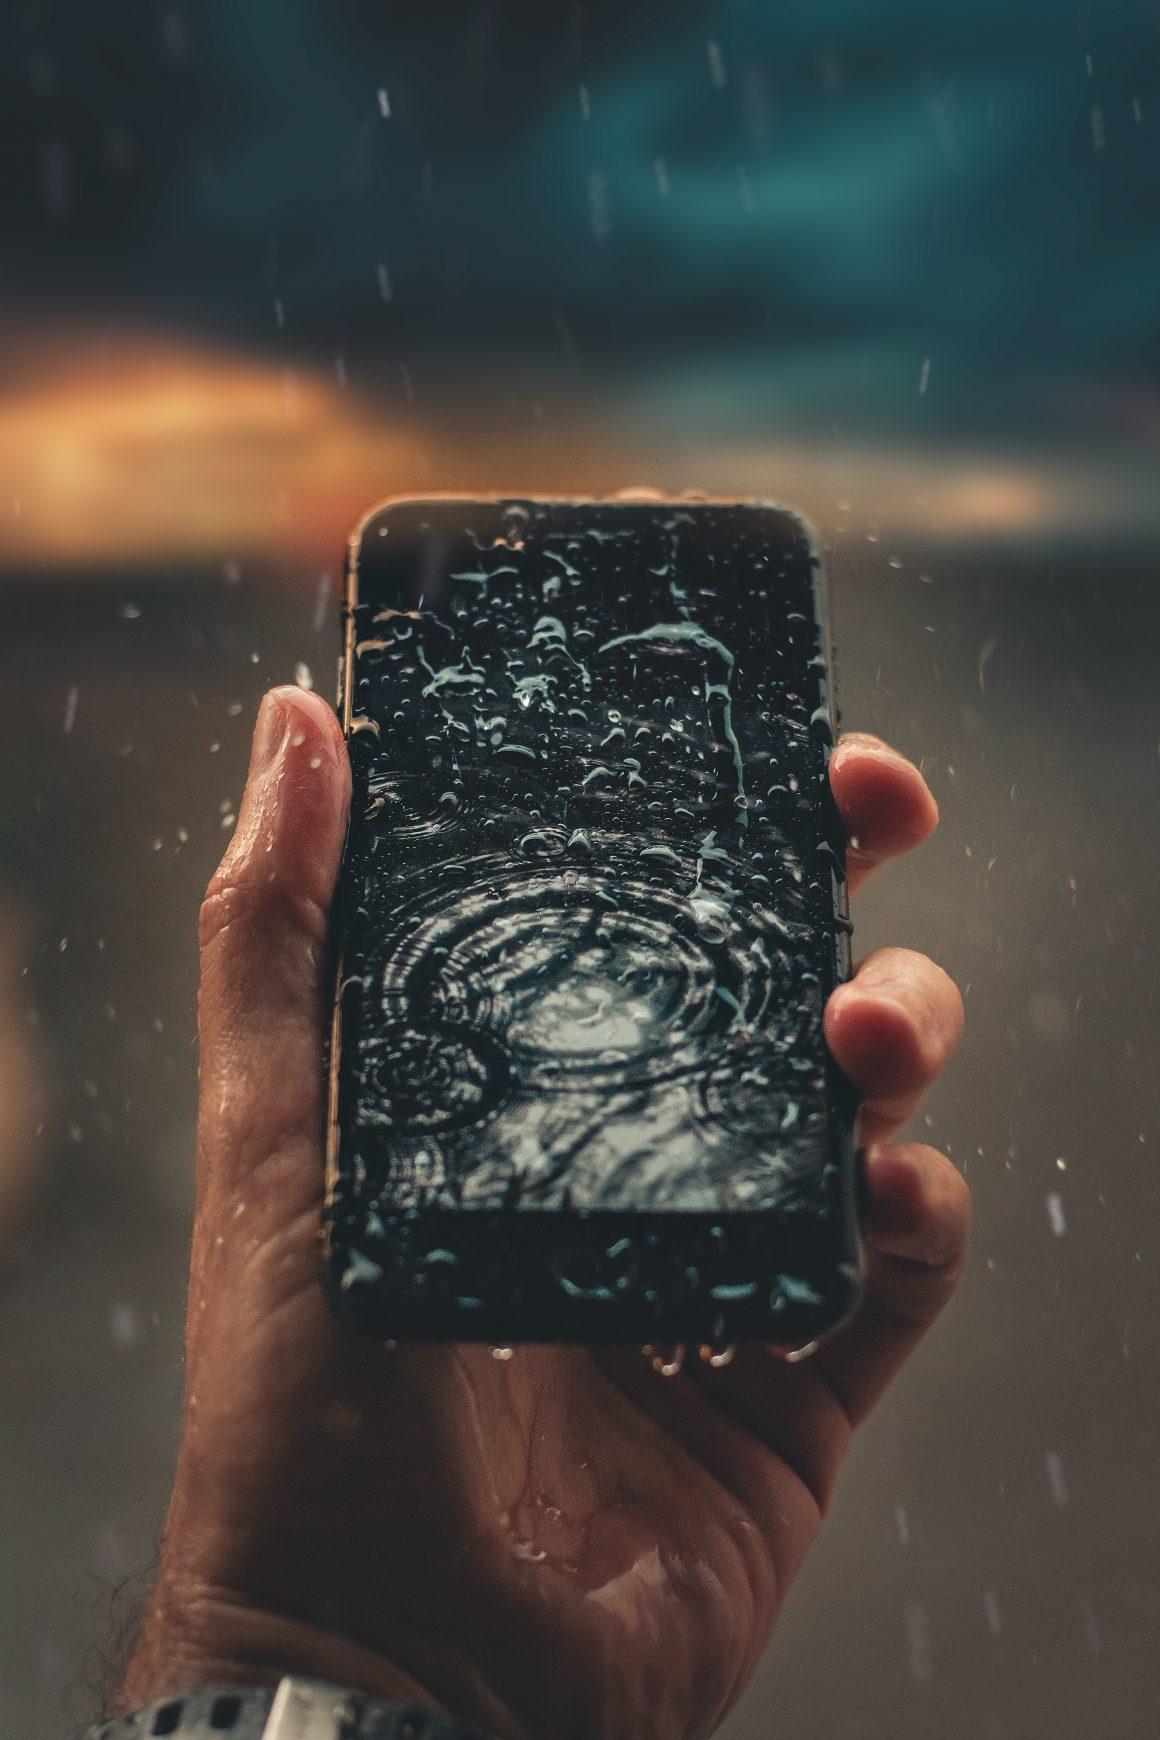 arreglar un móvil mojado